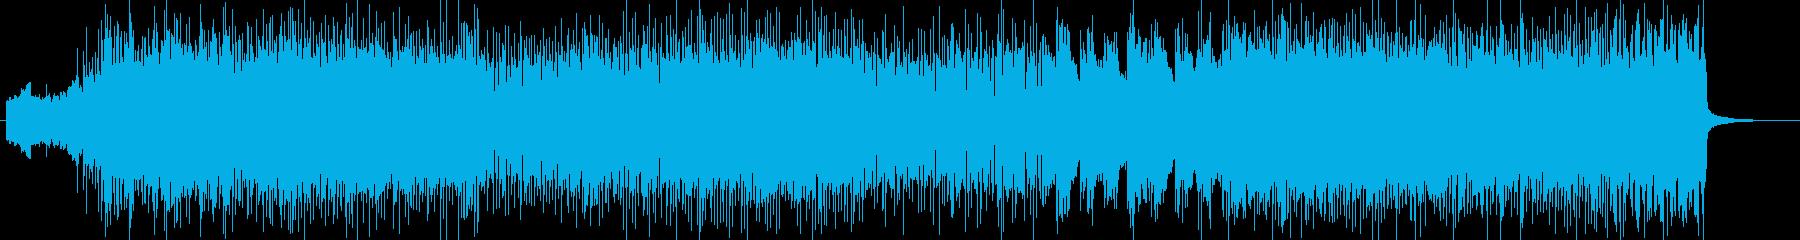 「HR/HM」「DEAD」BGM138の再生済みの波形